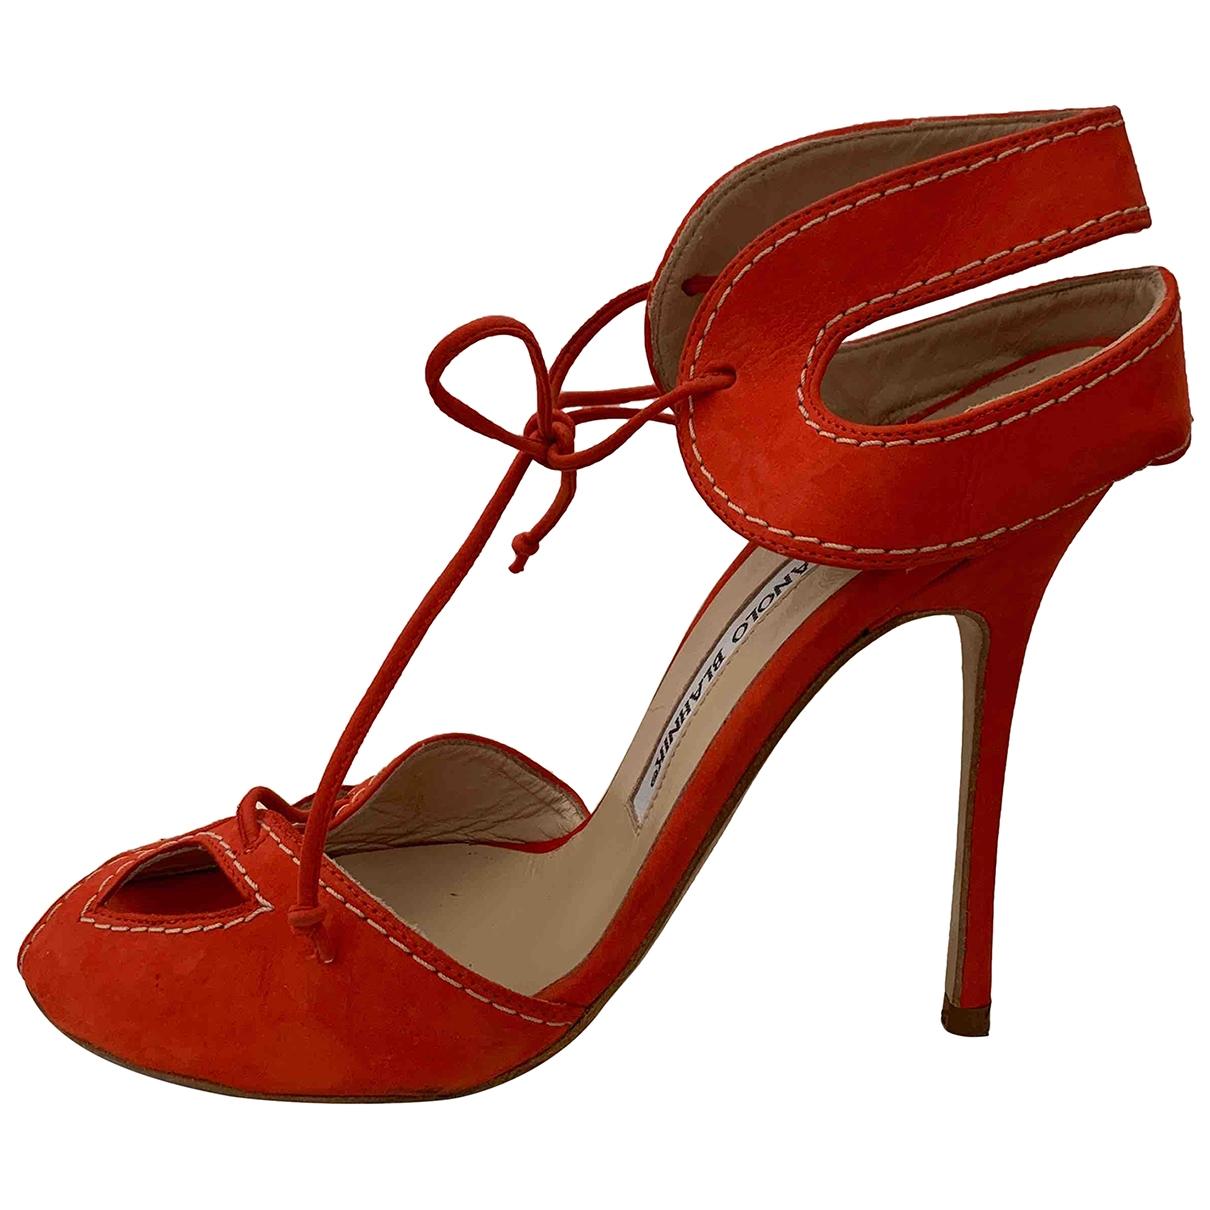 Manolo Blahnik \N Orange Suede Sandals for Women 36 EU